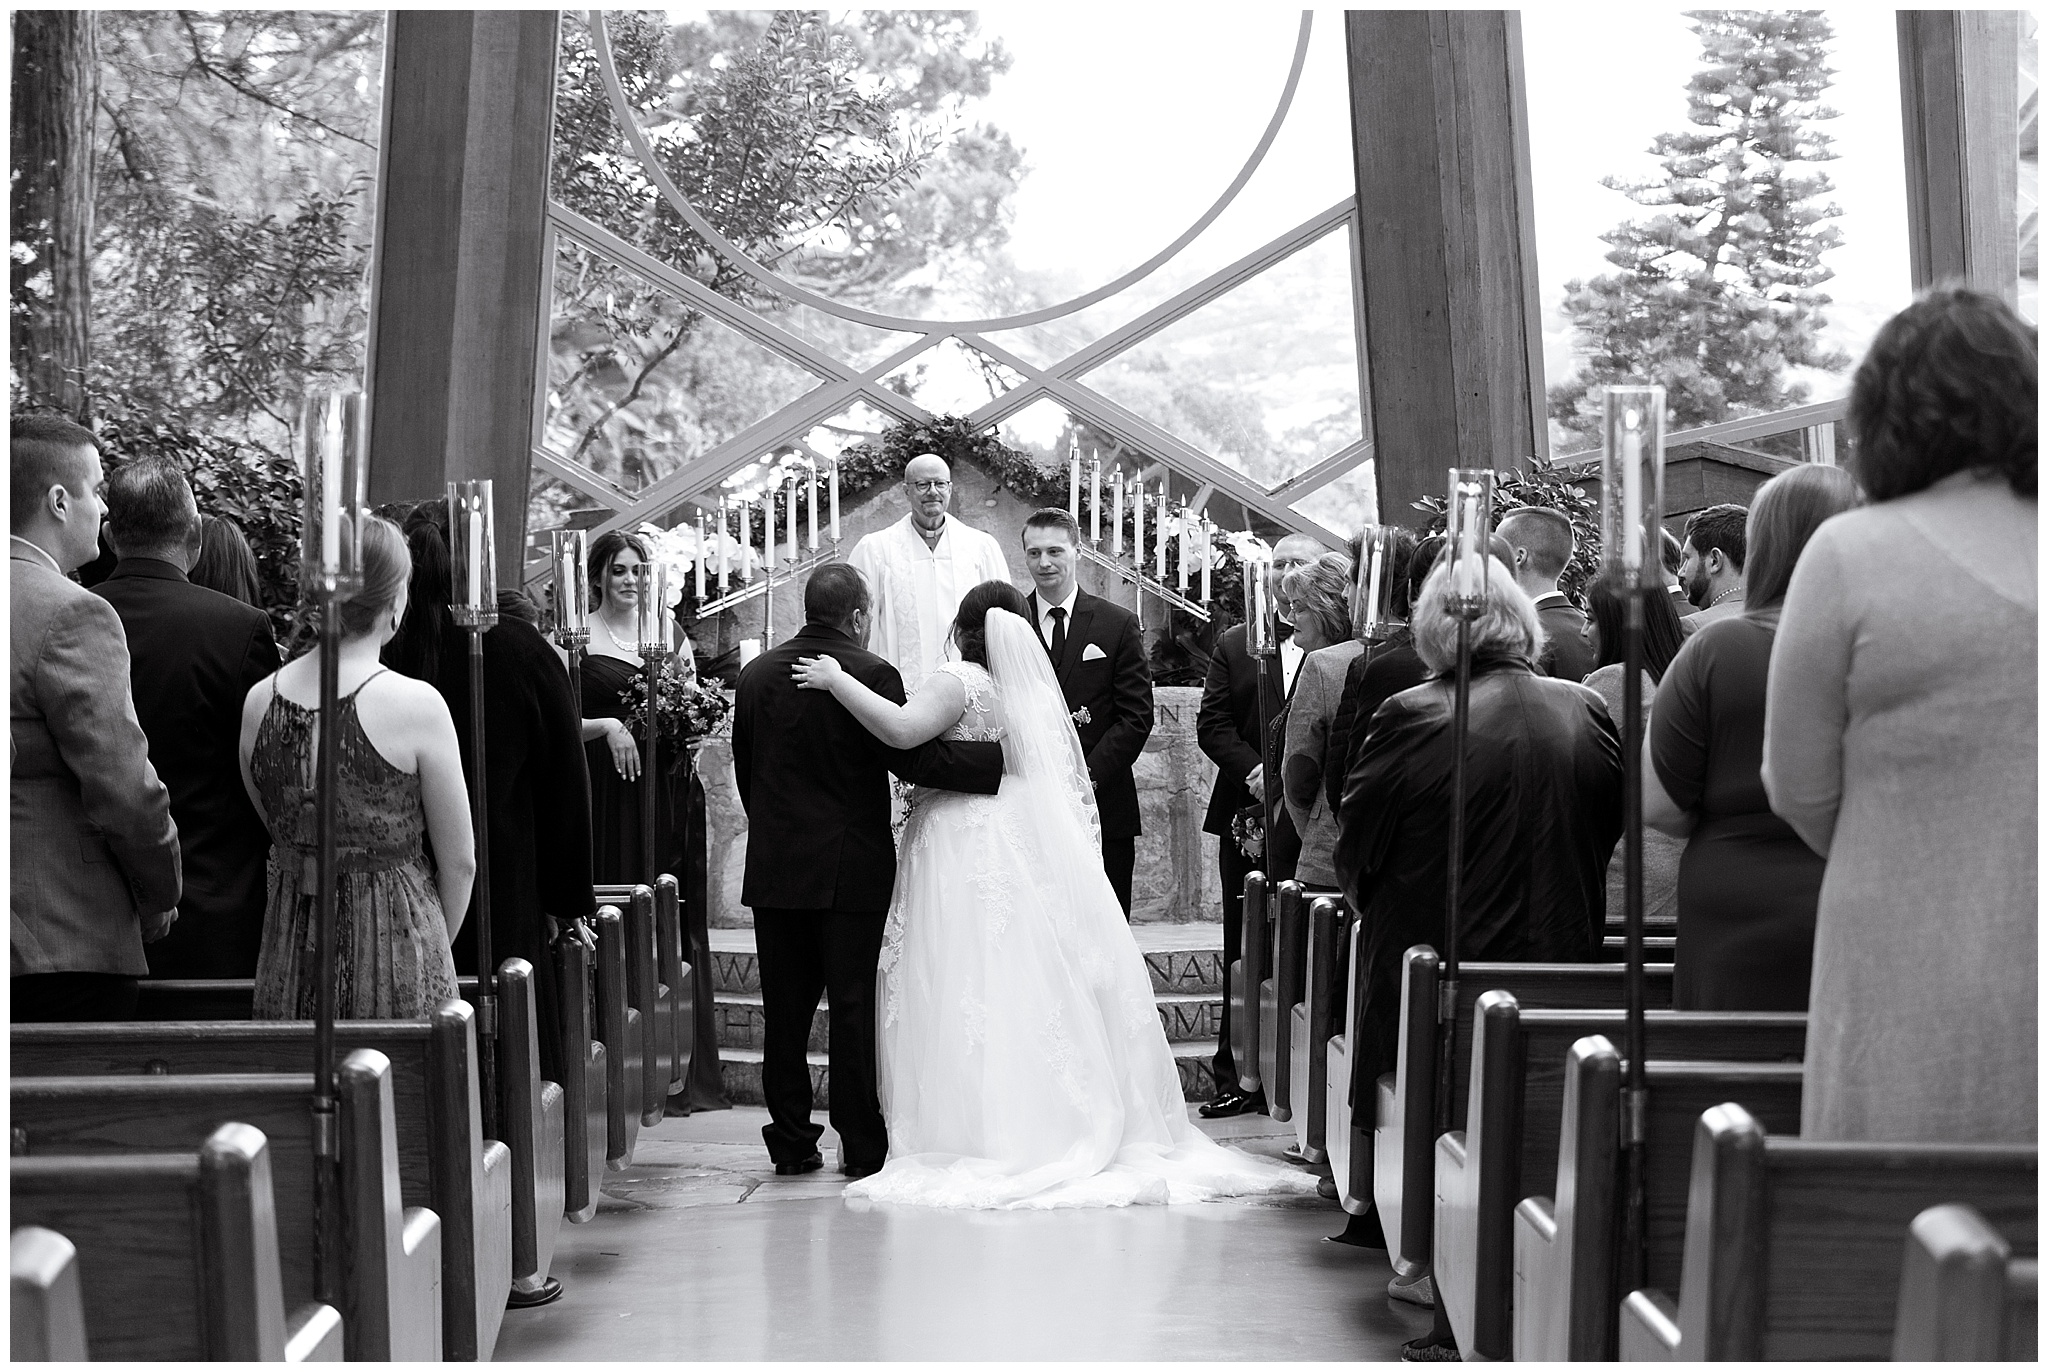 Carol_and_Grant_Wedding_3-3-18-8187-2.jpg